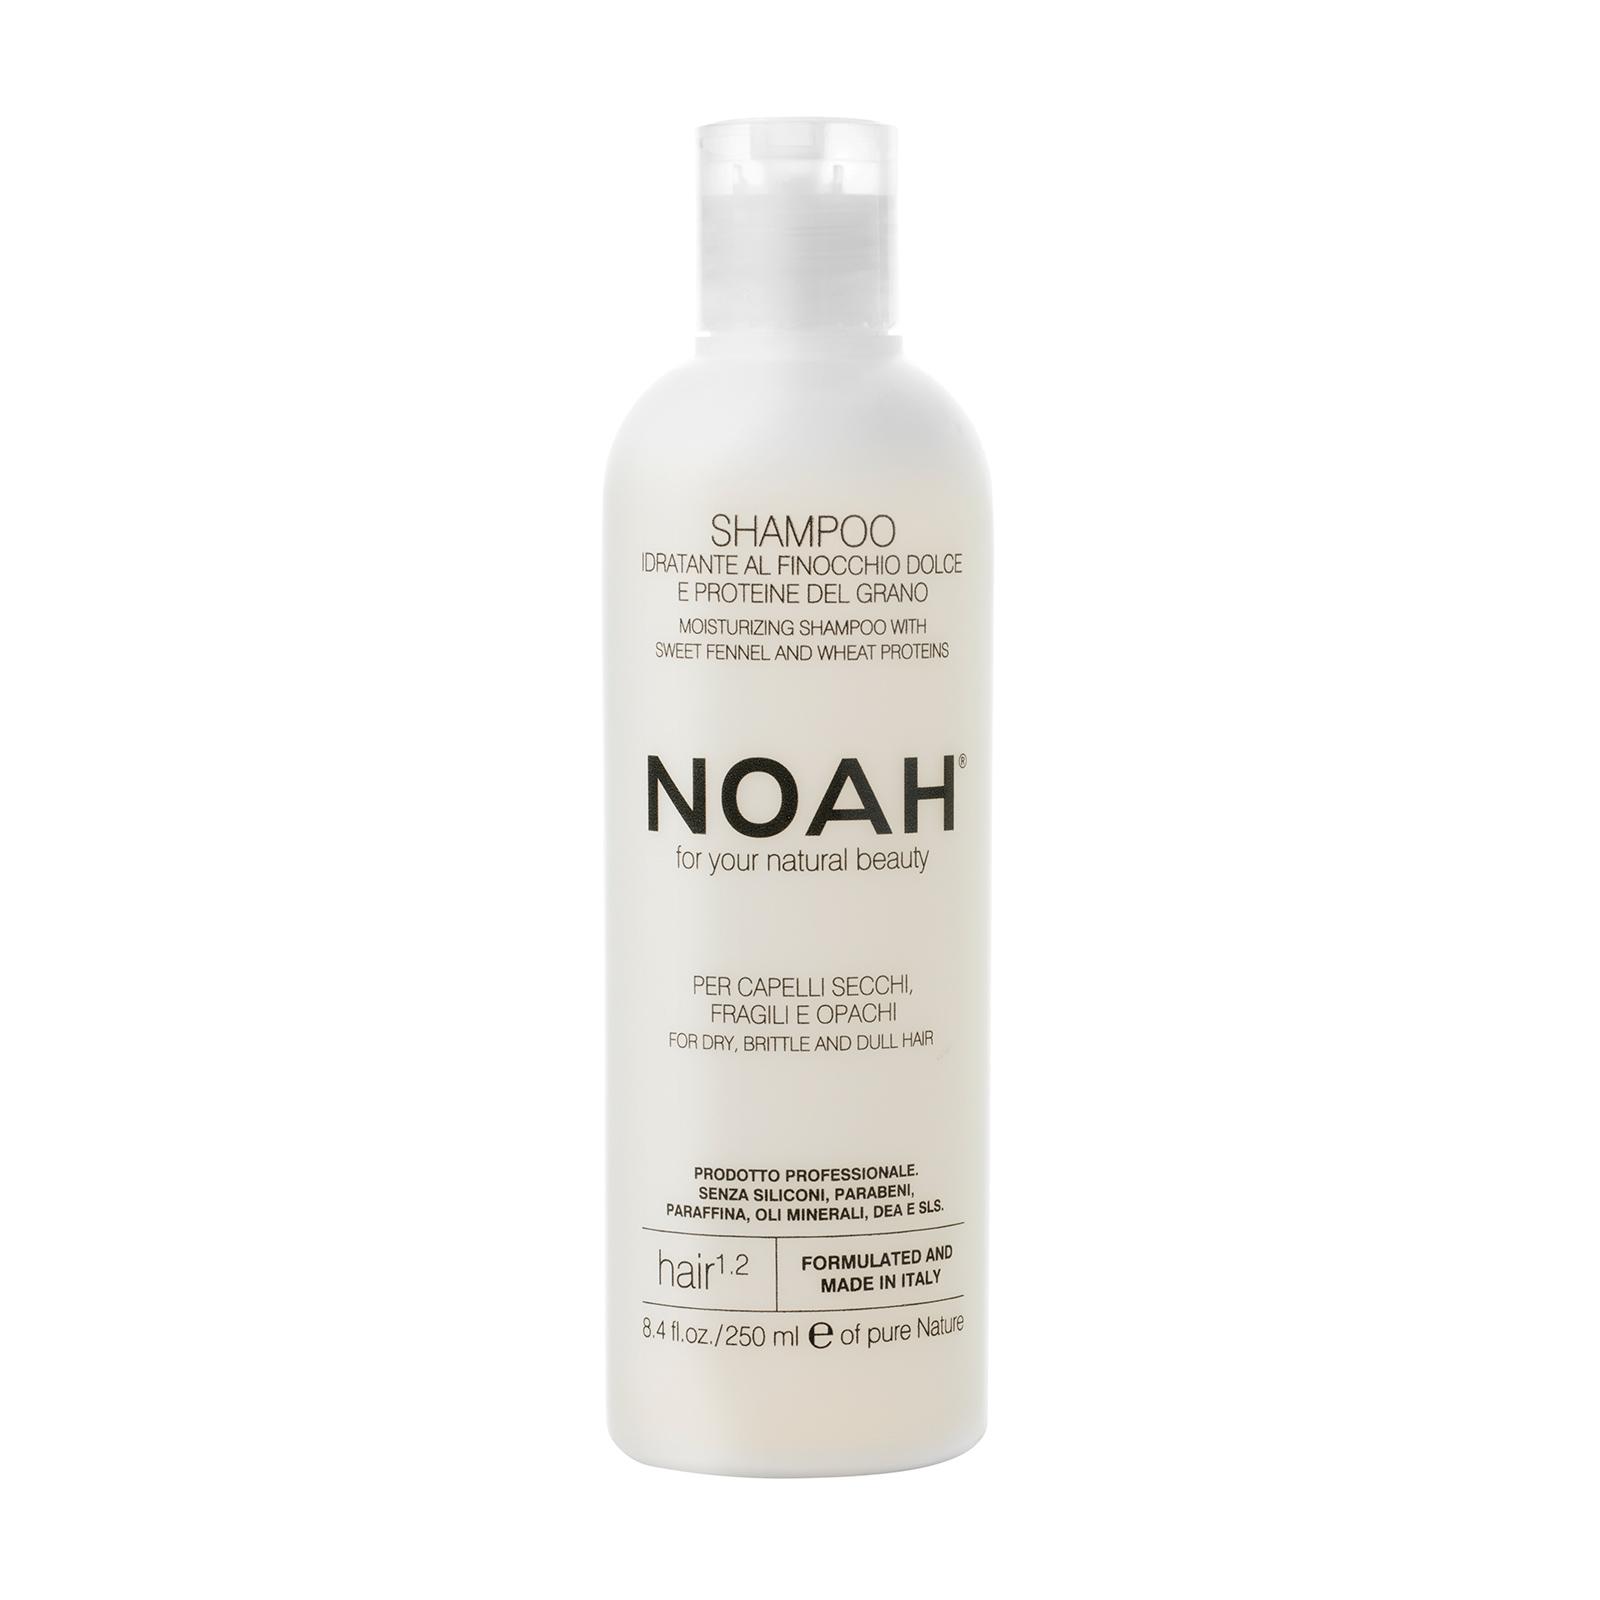 Shampoo NOAH per capelli secchi e opachi 3a6bb6492c9f